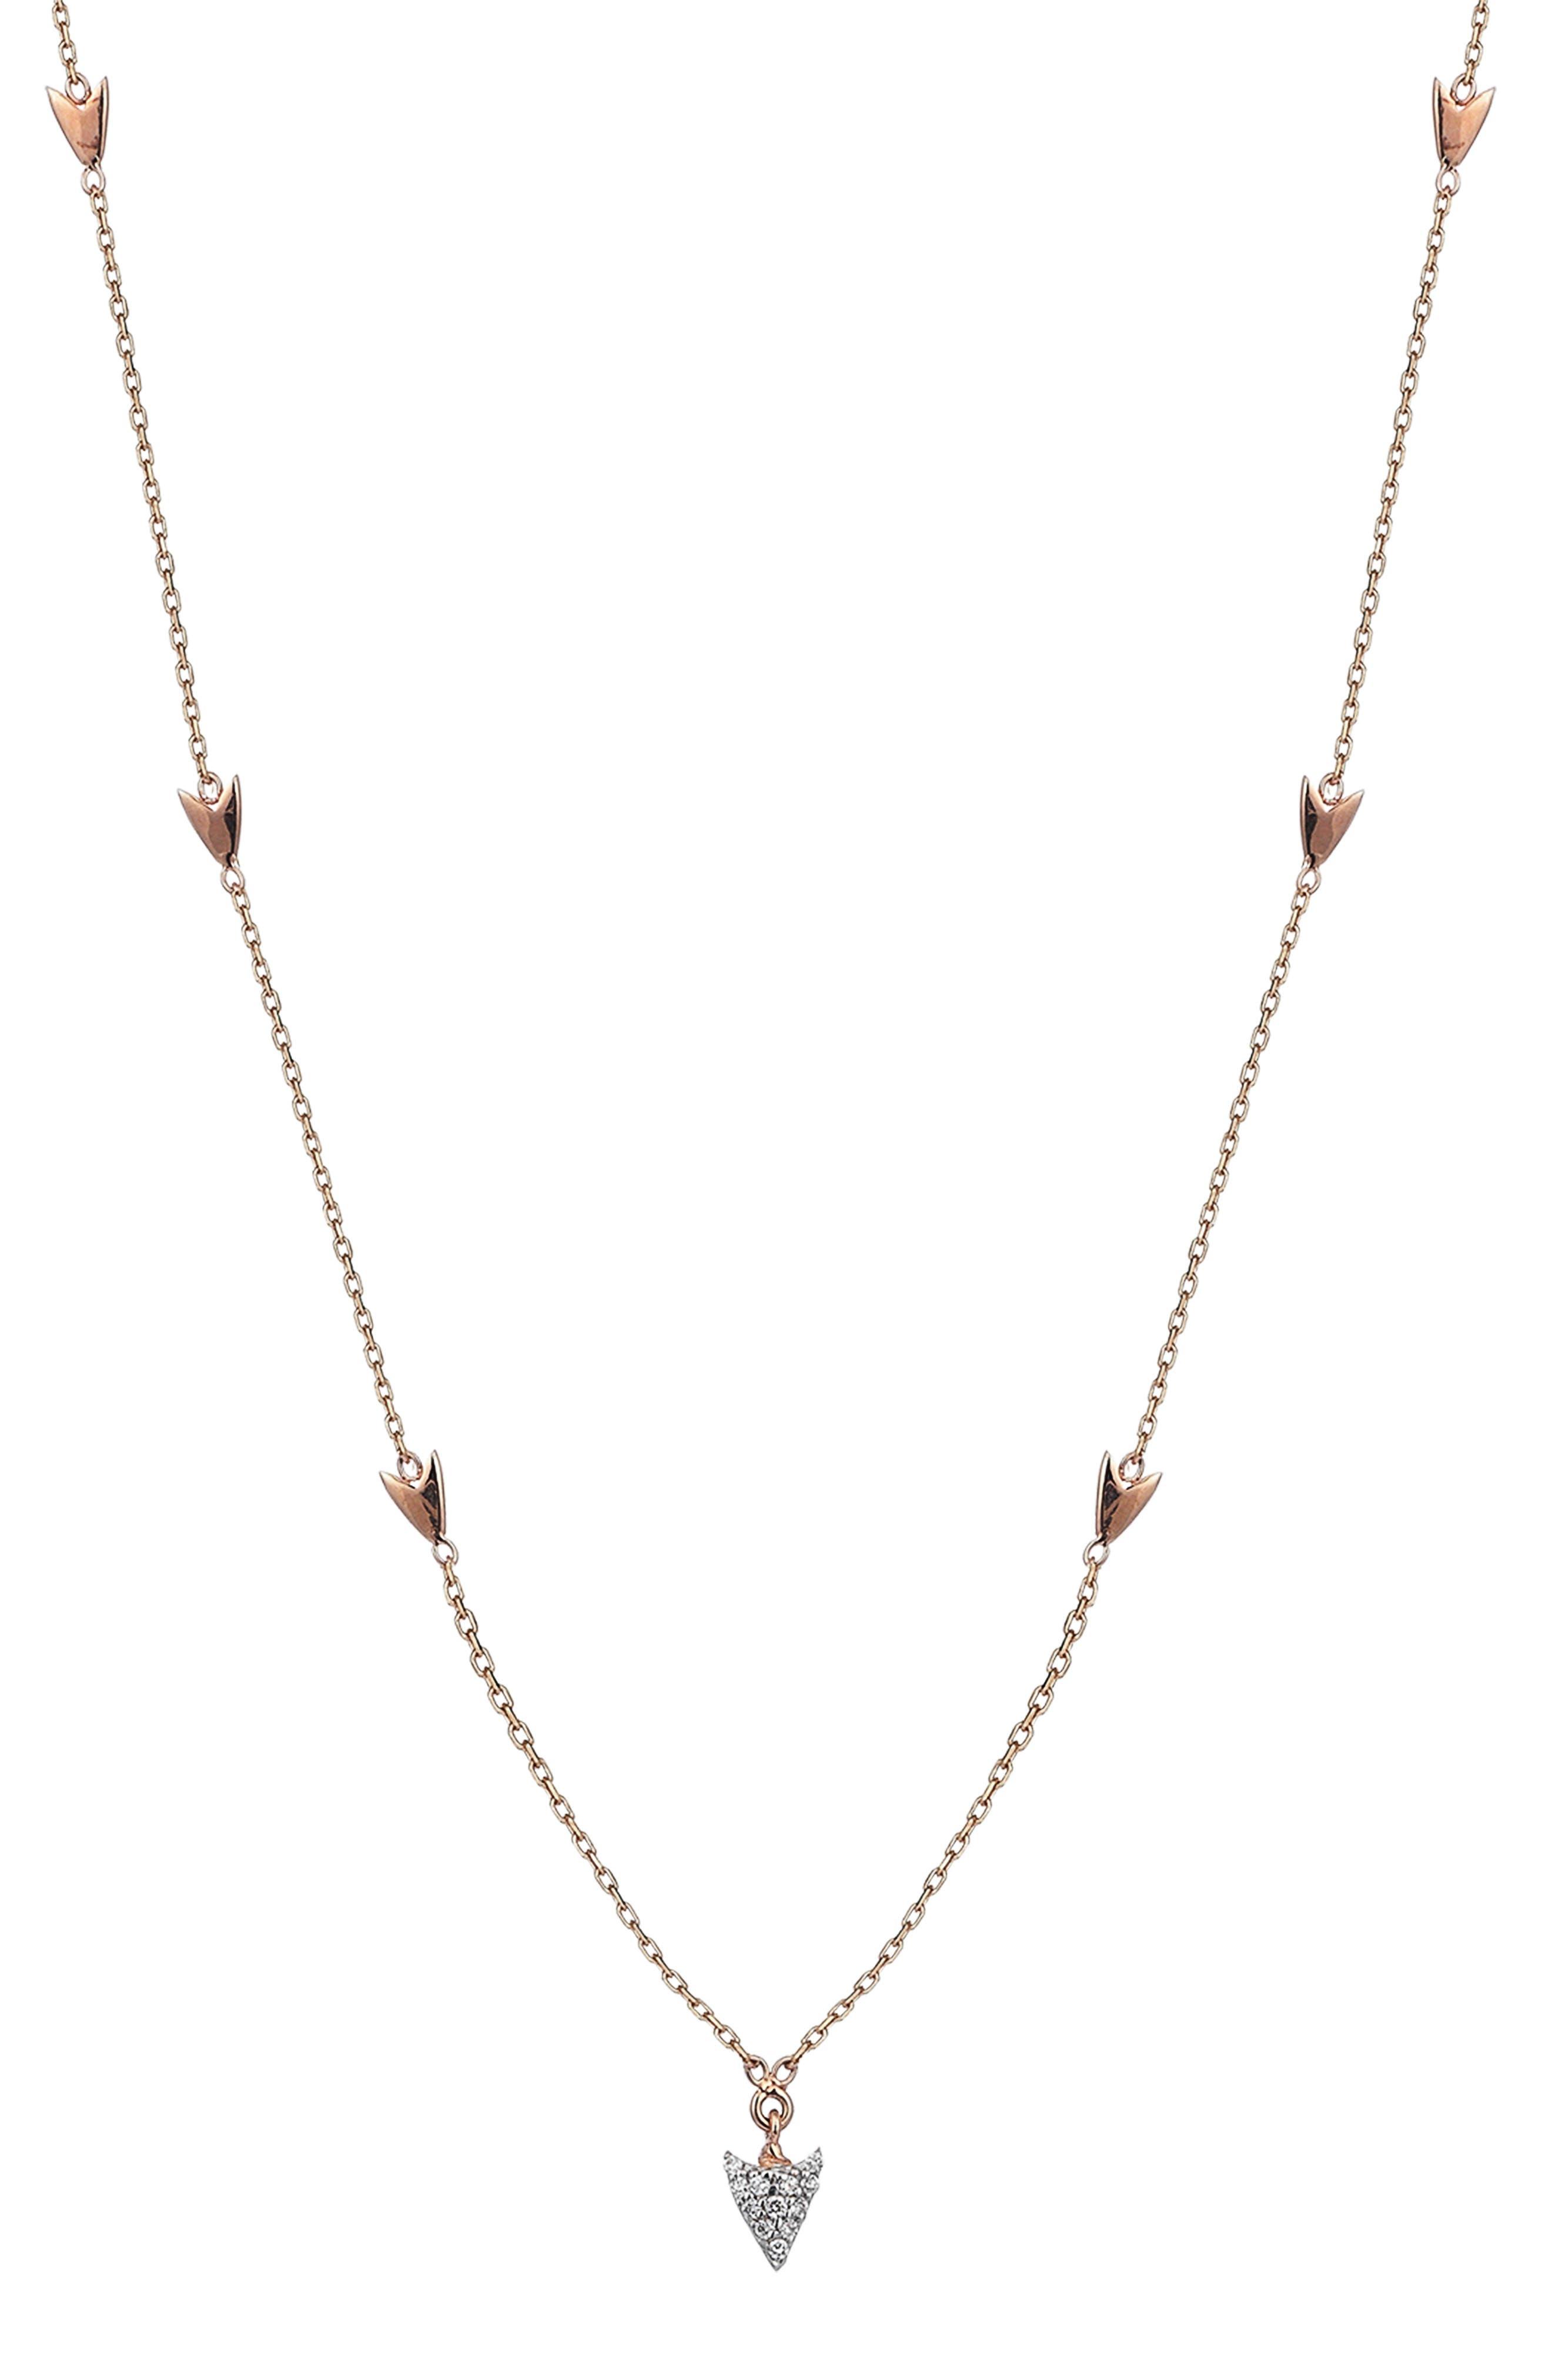 Diamond Arrow Station Necklace,                             Main thumbnail 1, color,                             ROSE GOLD/ DIAMOND